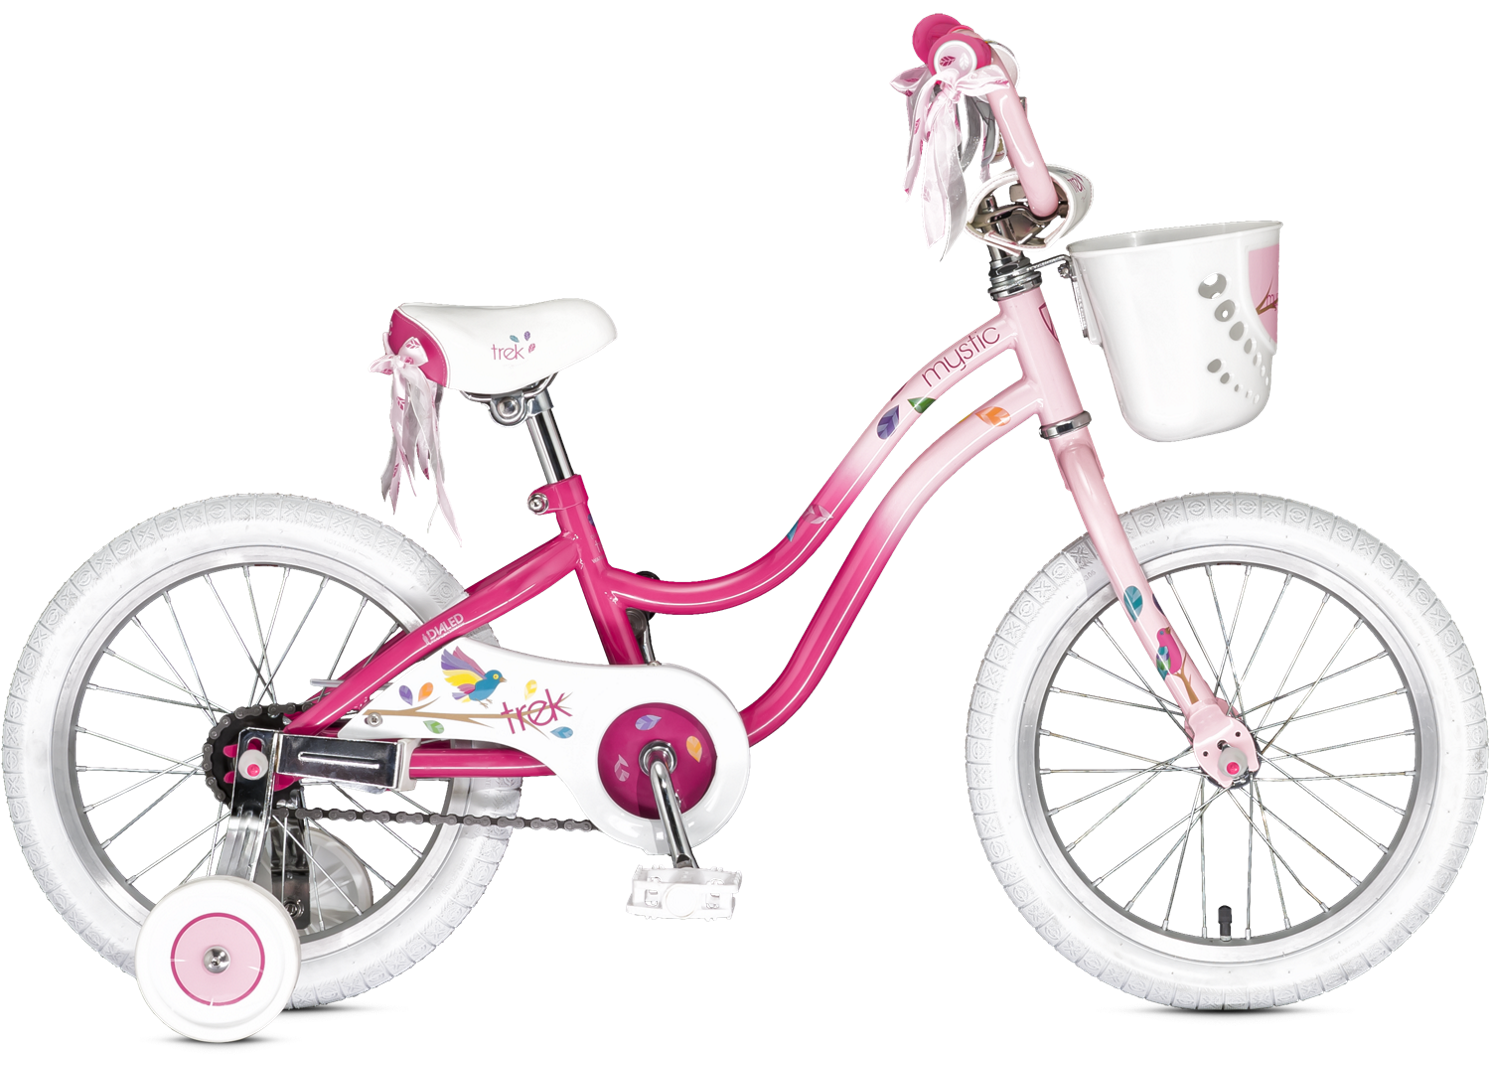 165616836b6 Mystic 16 - Kids' collection - Trek Bicycle | S16_BIC_Kids | Bicycle ...